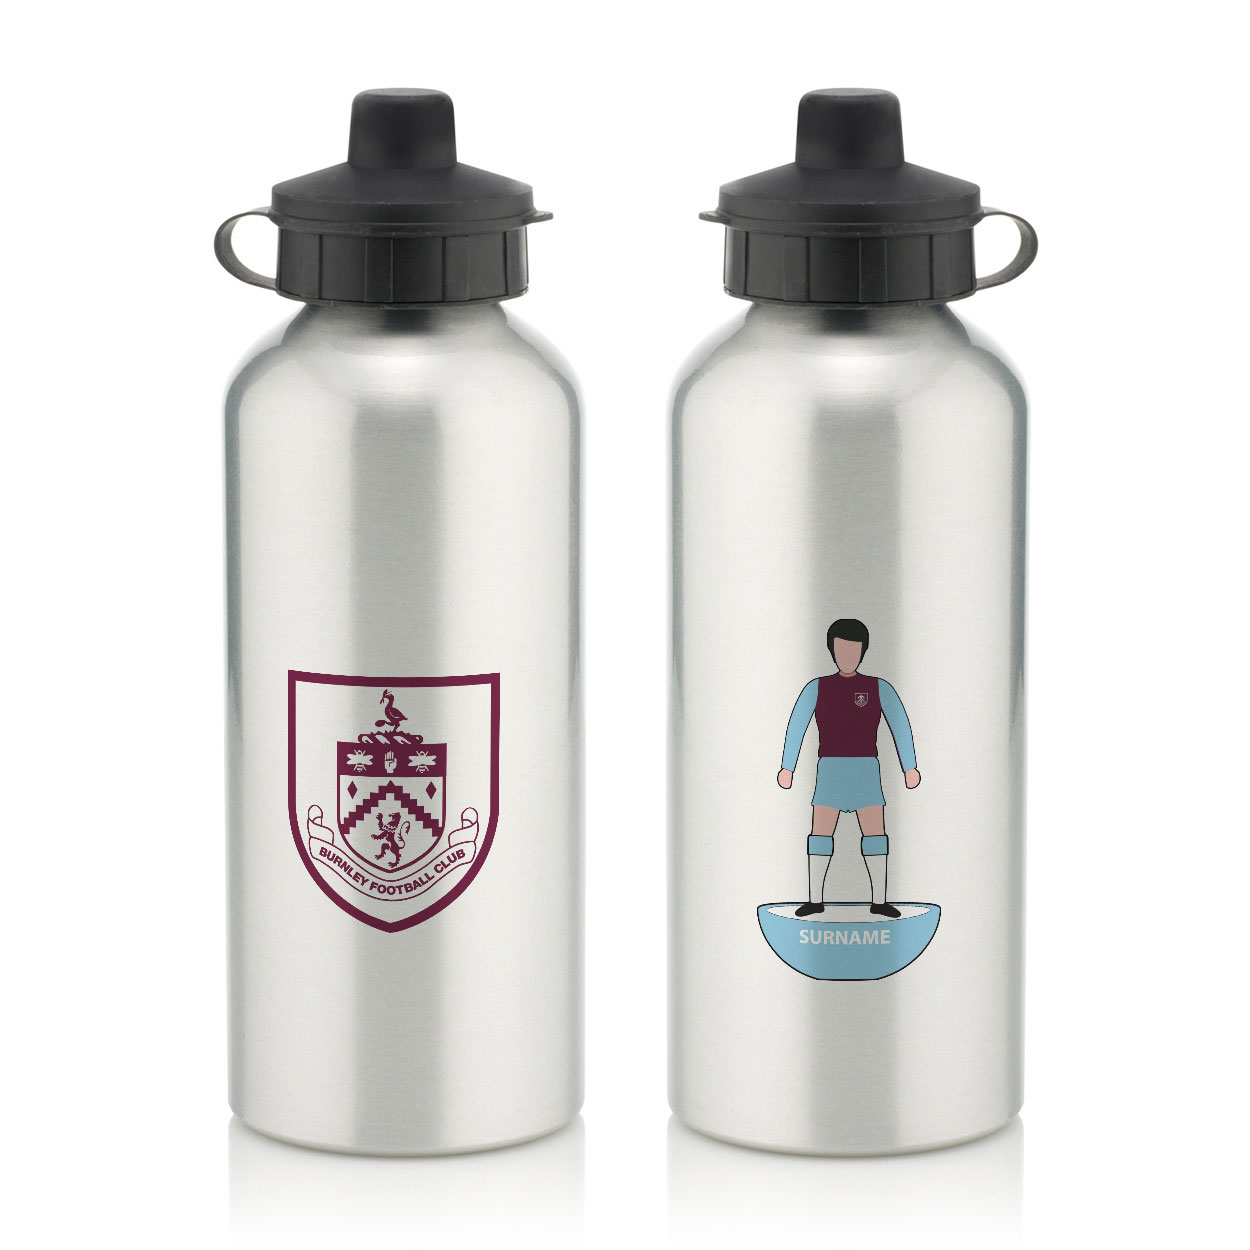 Burnley FC Player Figure Water Bottle